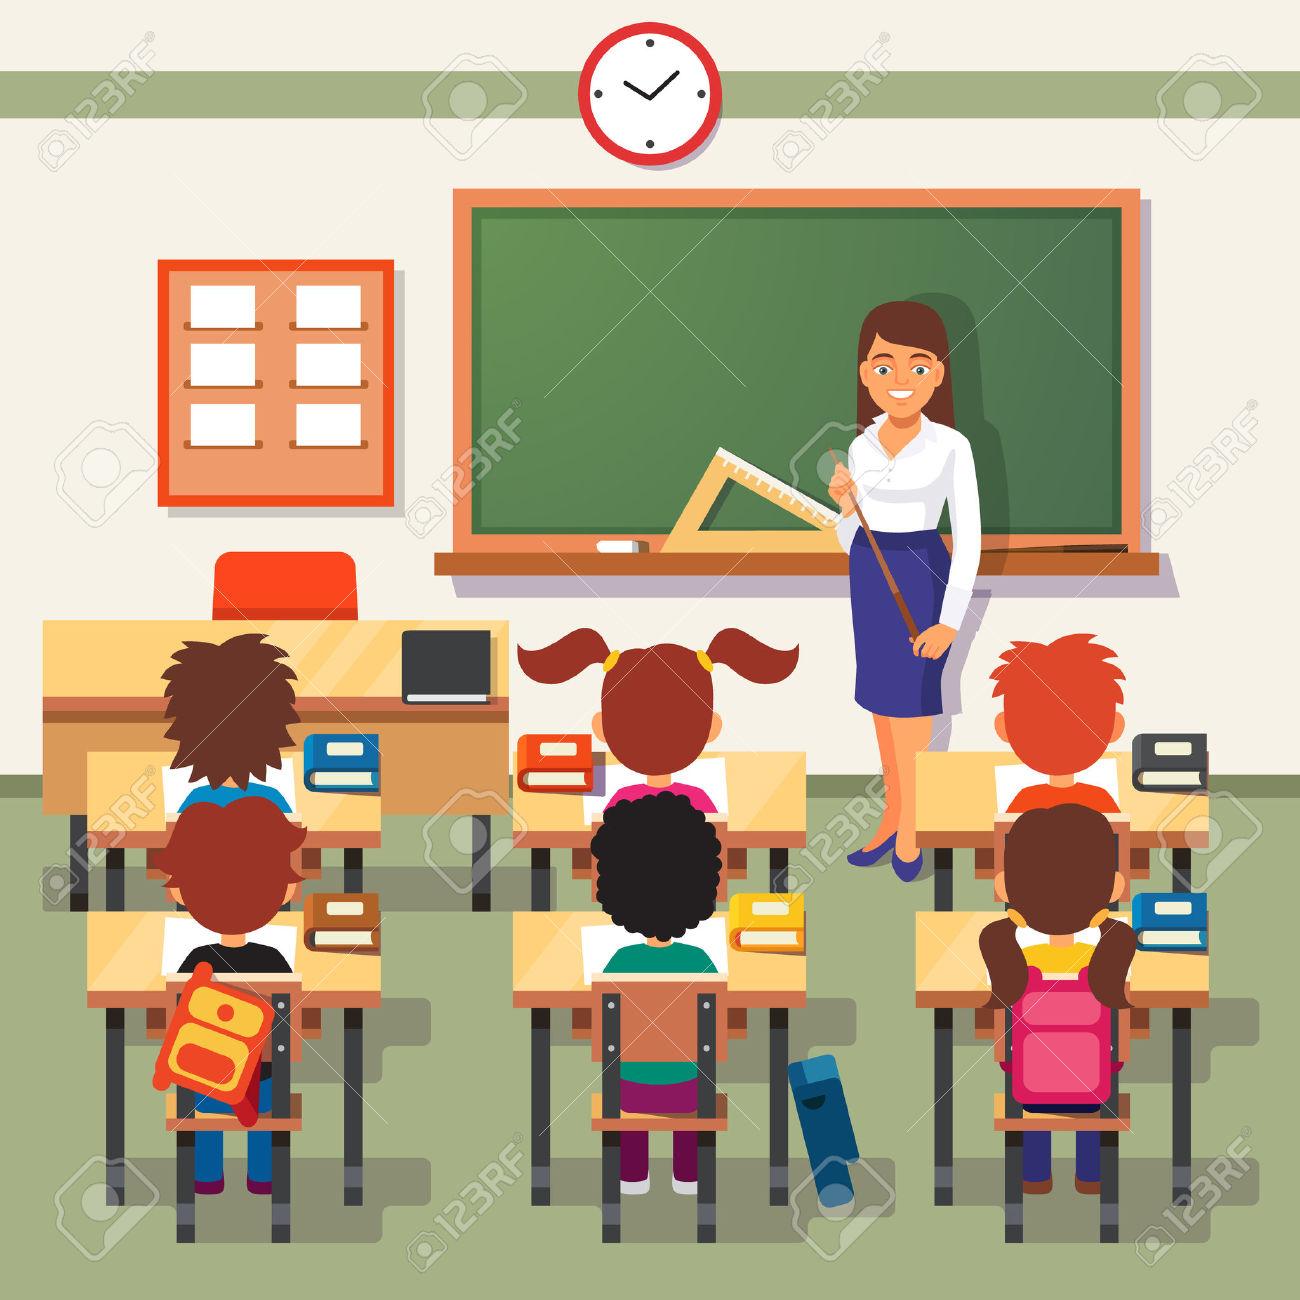 A teacher in a classroom with a skirt on clipart.